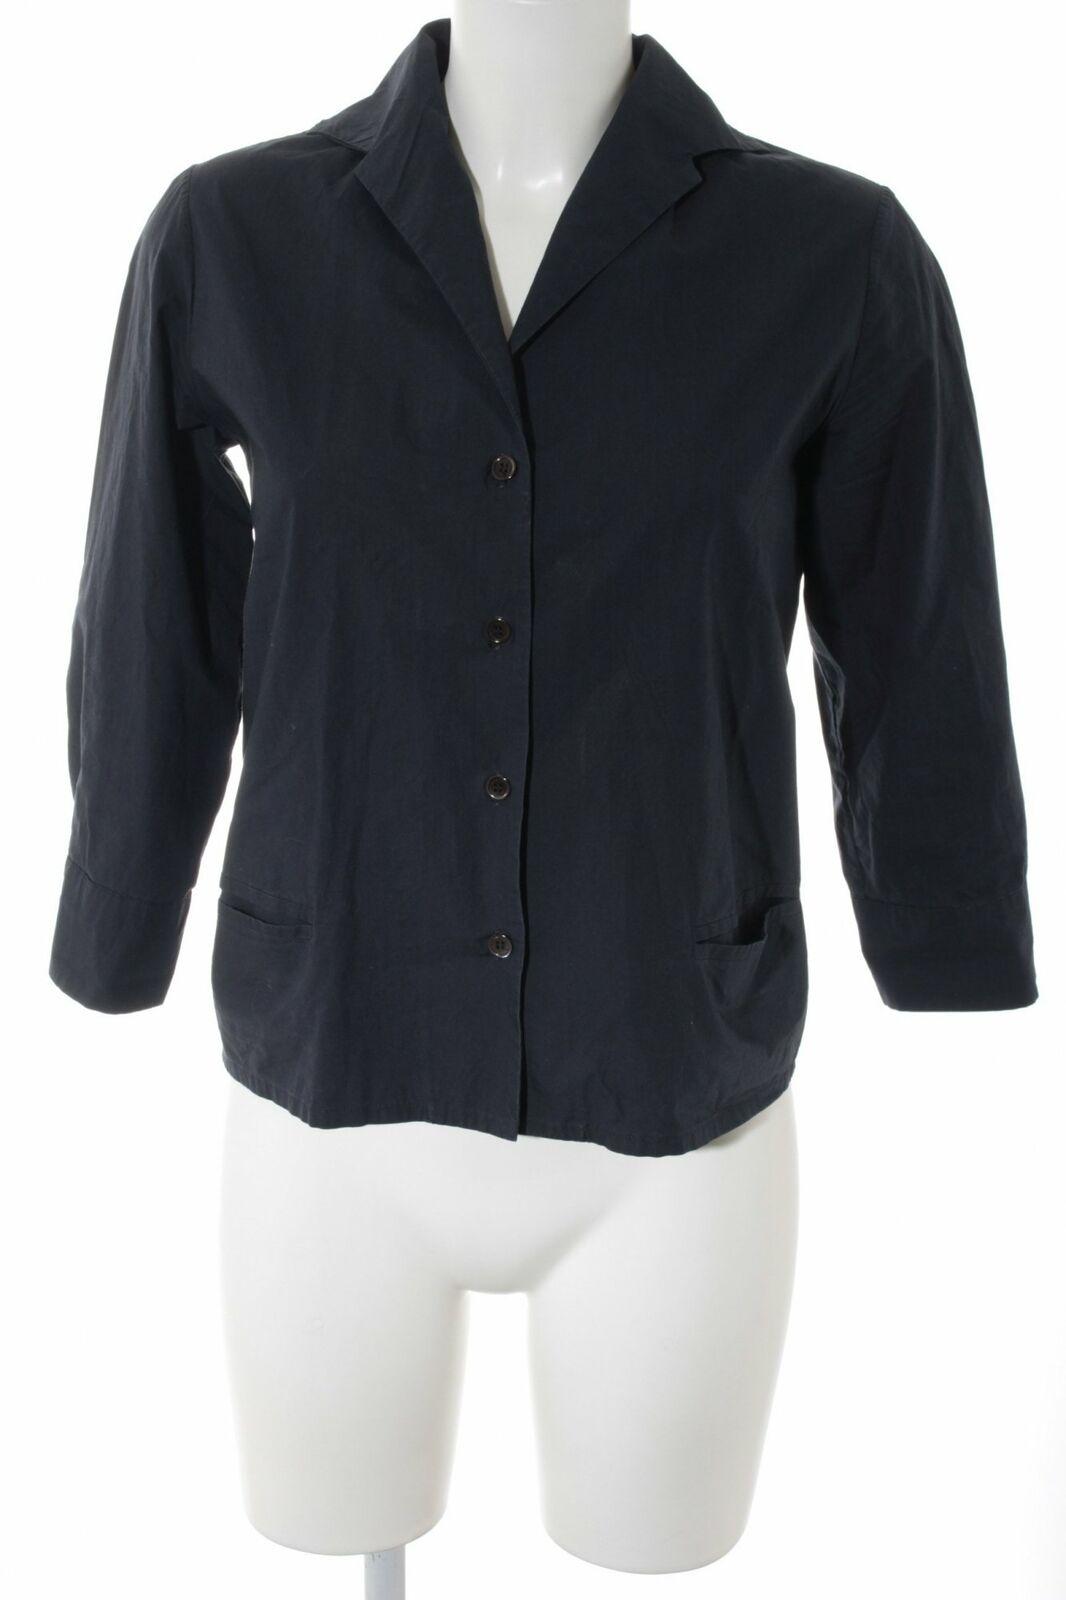 MARNI MARNI MARNI Langarmhemd dunkelblau schlichter Stil Damen Gr. DE 40 Hemd Formal Shirt  | Komfort  | Stil  | Attraktiv Und Langlebig  | Fairer Preis  | Adoptieren  dece3d